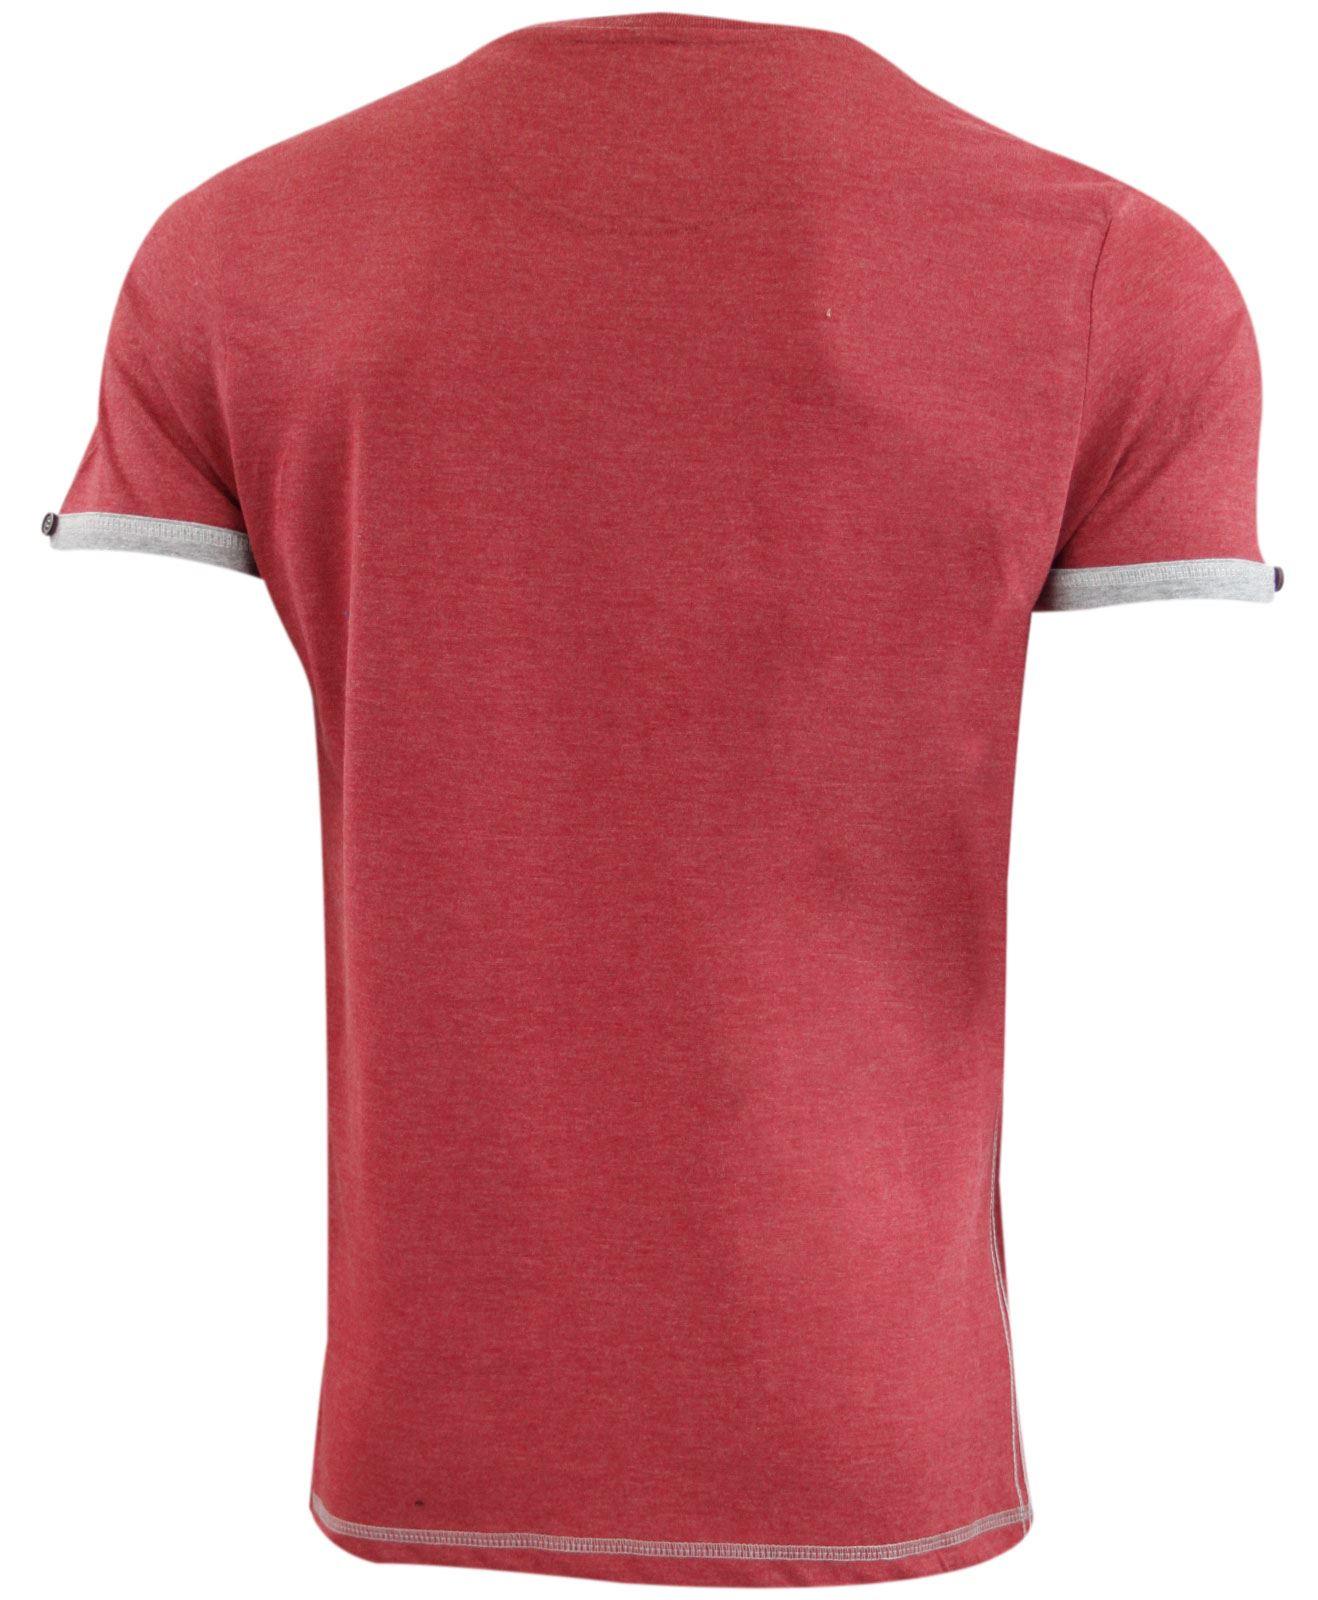 Mens New Smith & Jones Designer Raised Printed Crew Neck Cotton T-Shirt Top